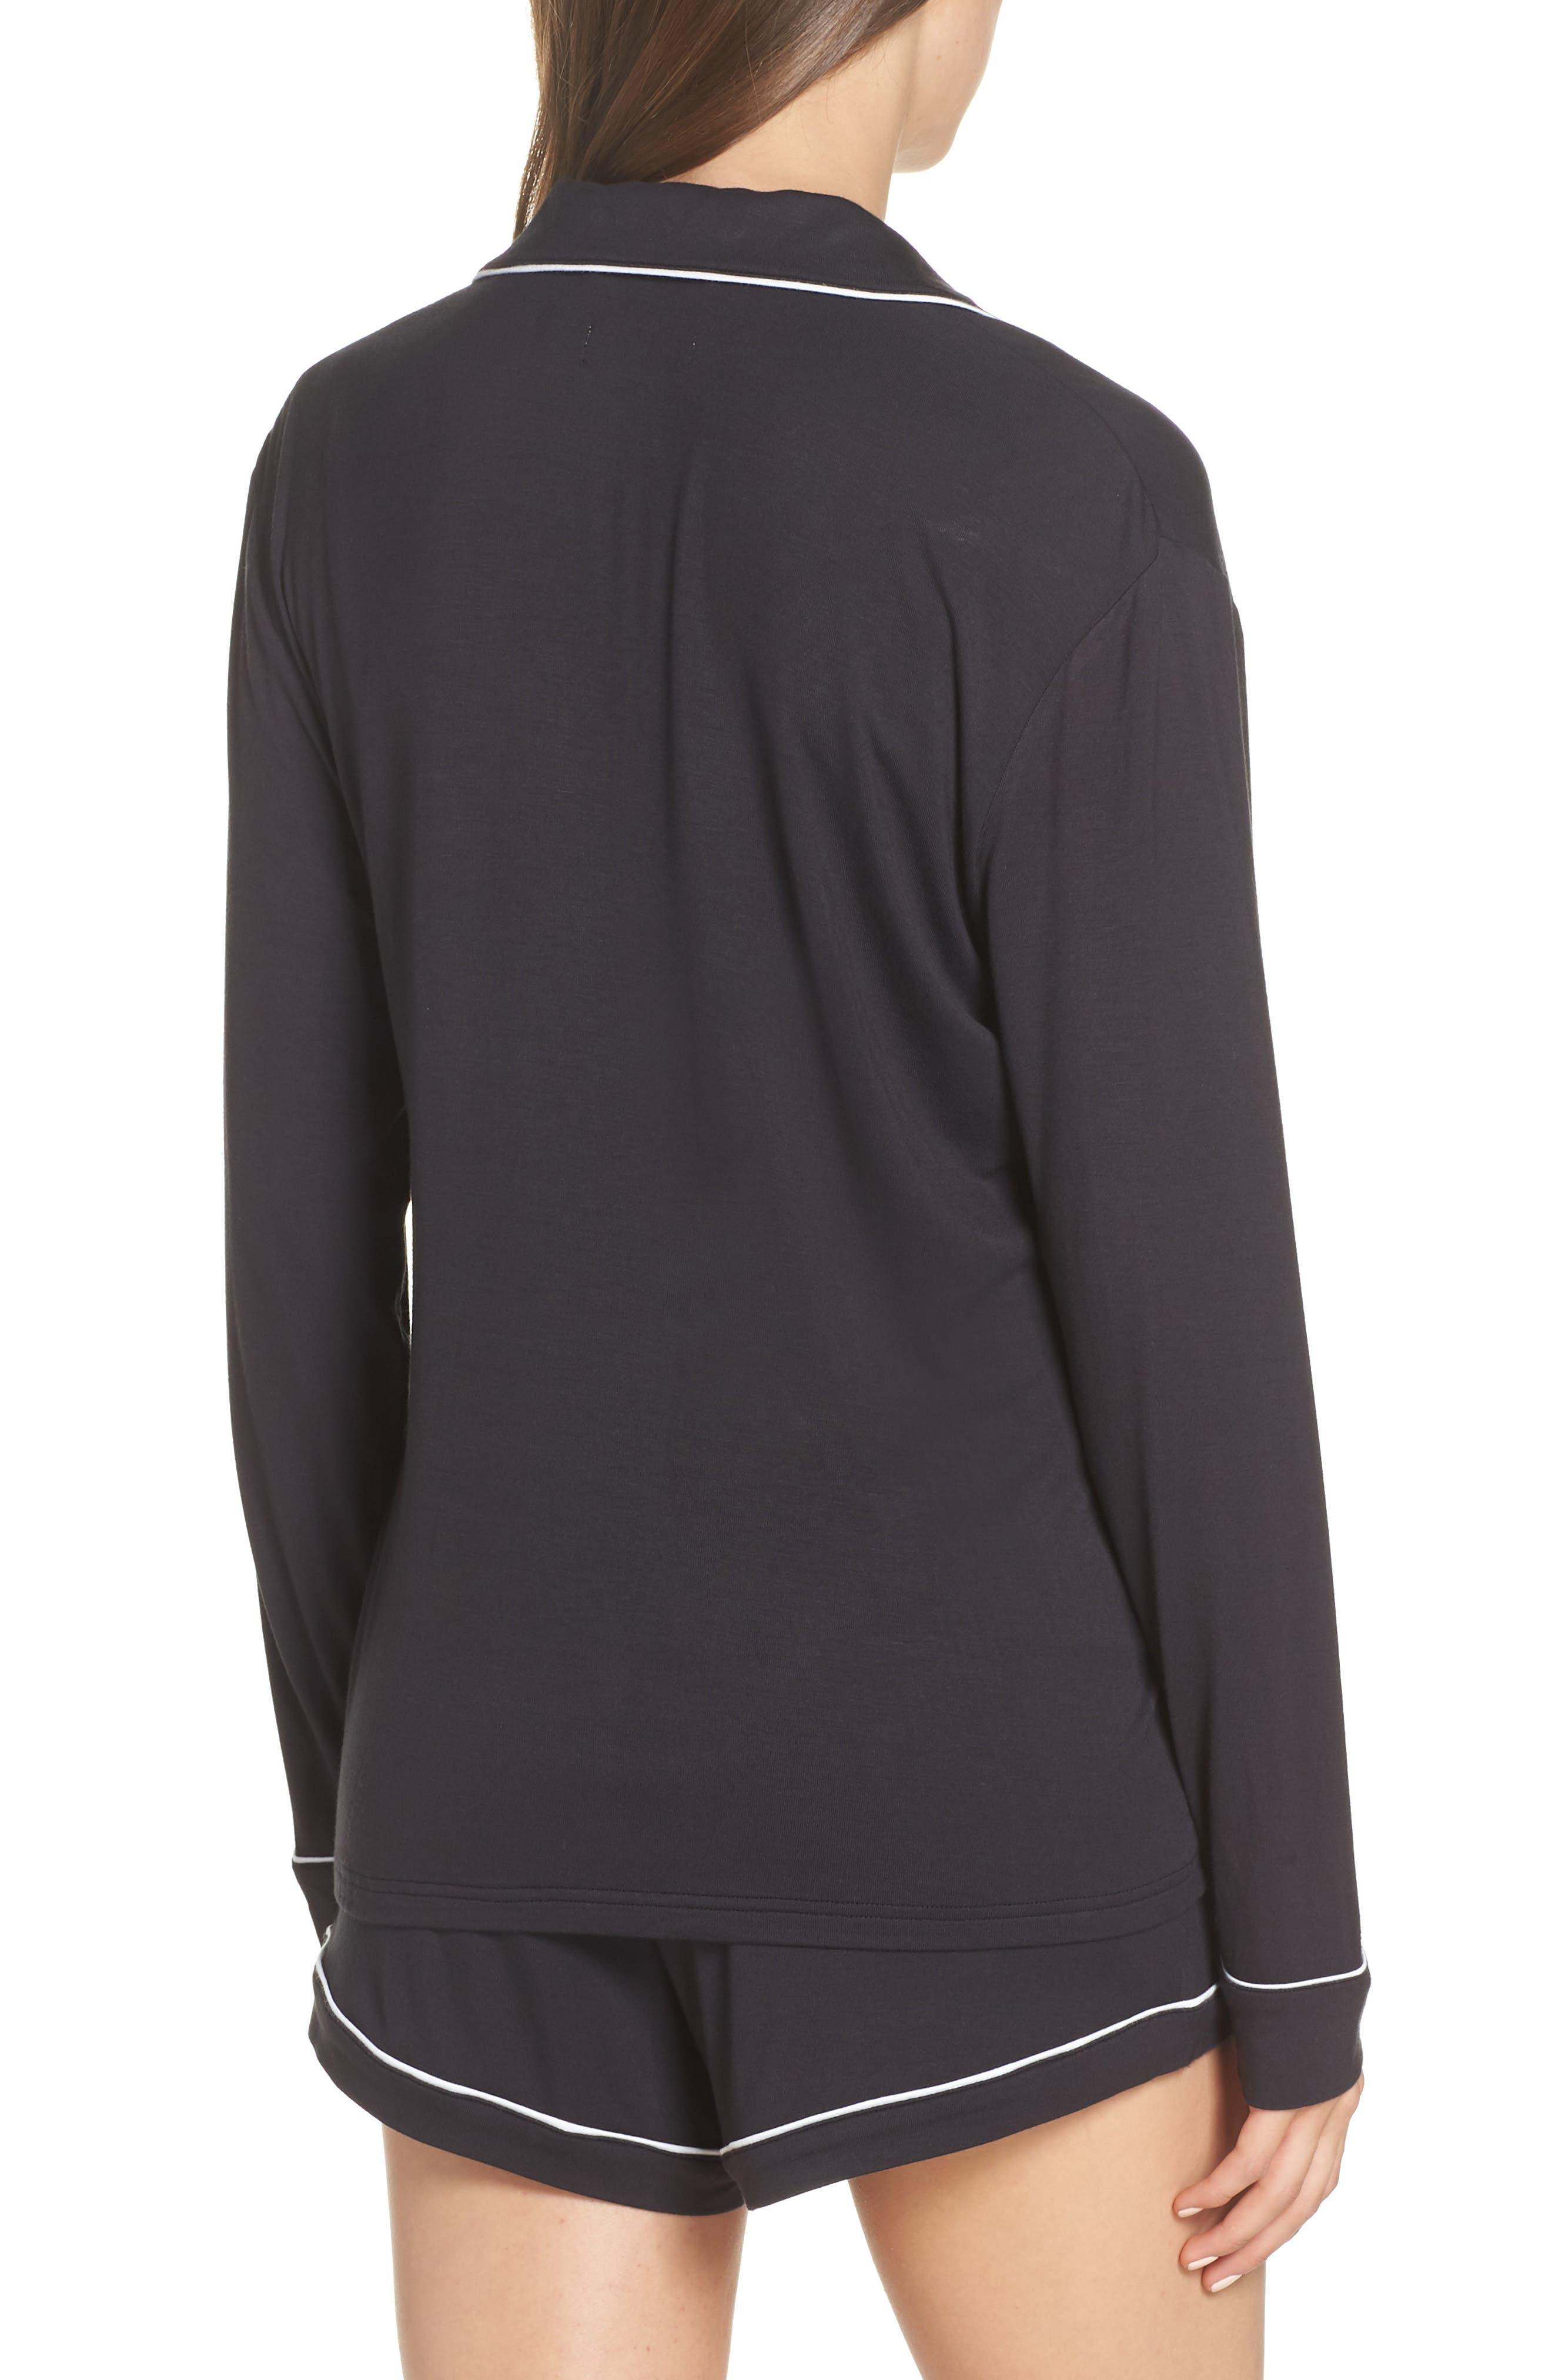 Nya Short Pajamas,                             Alternate thumbnail 2, color,                             BLACK